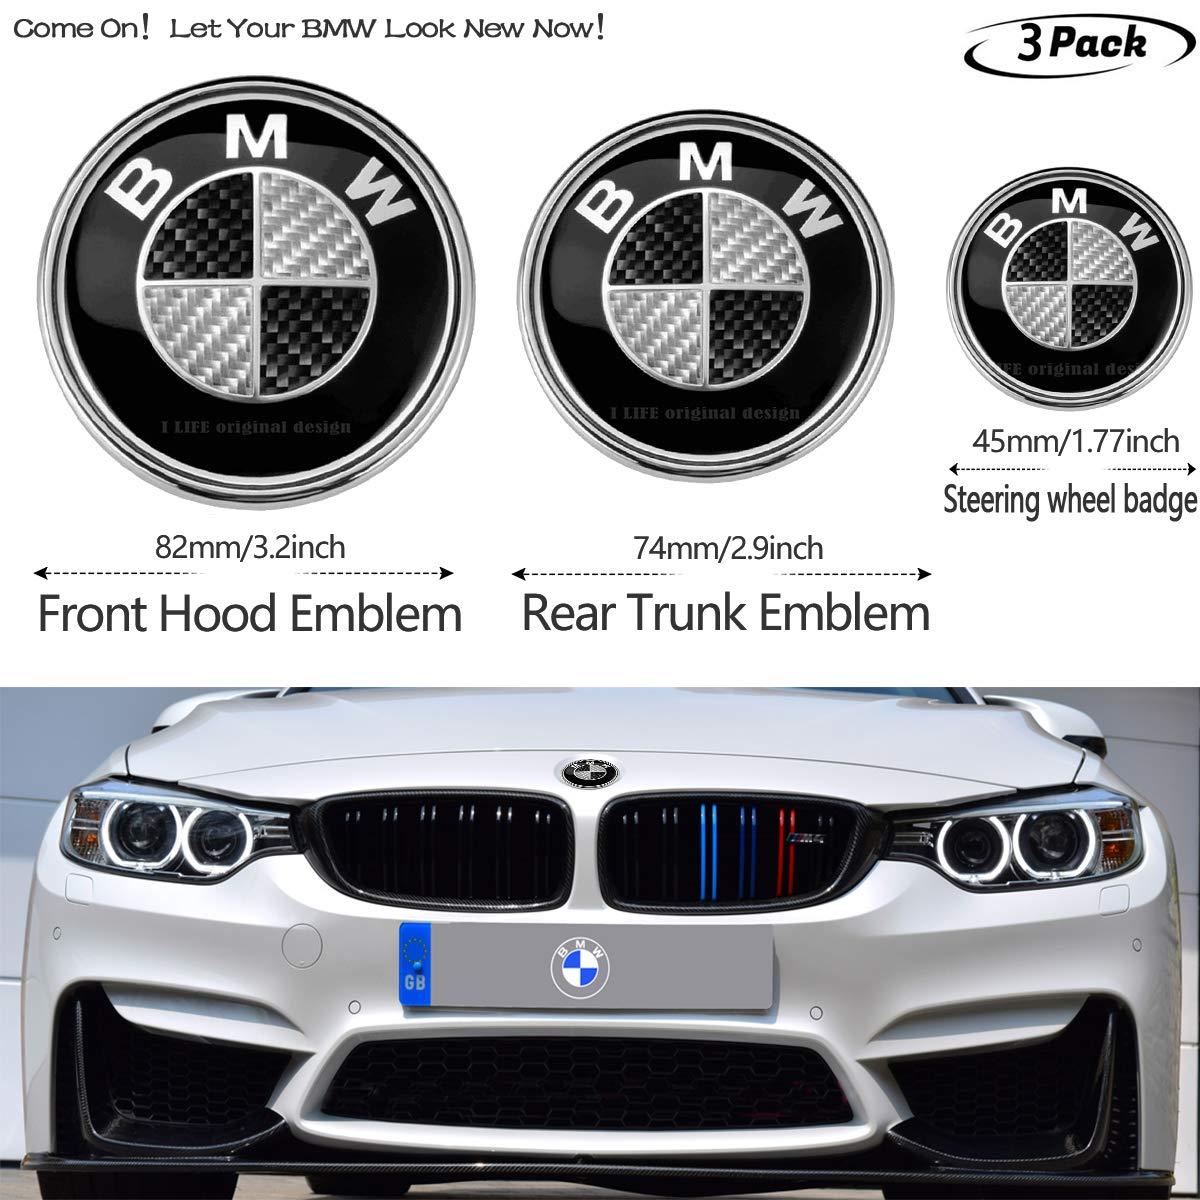 Emblems 3pcs Black and White BMW Carbon fiber texture 82mm Hood ...